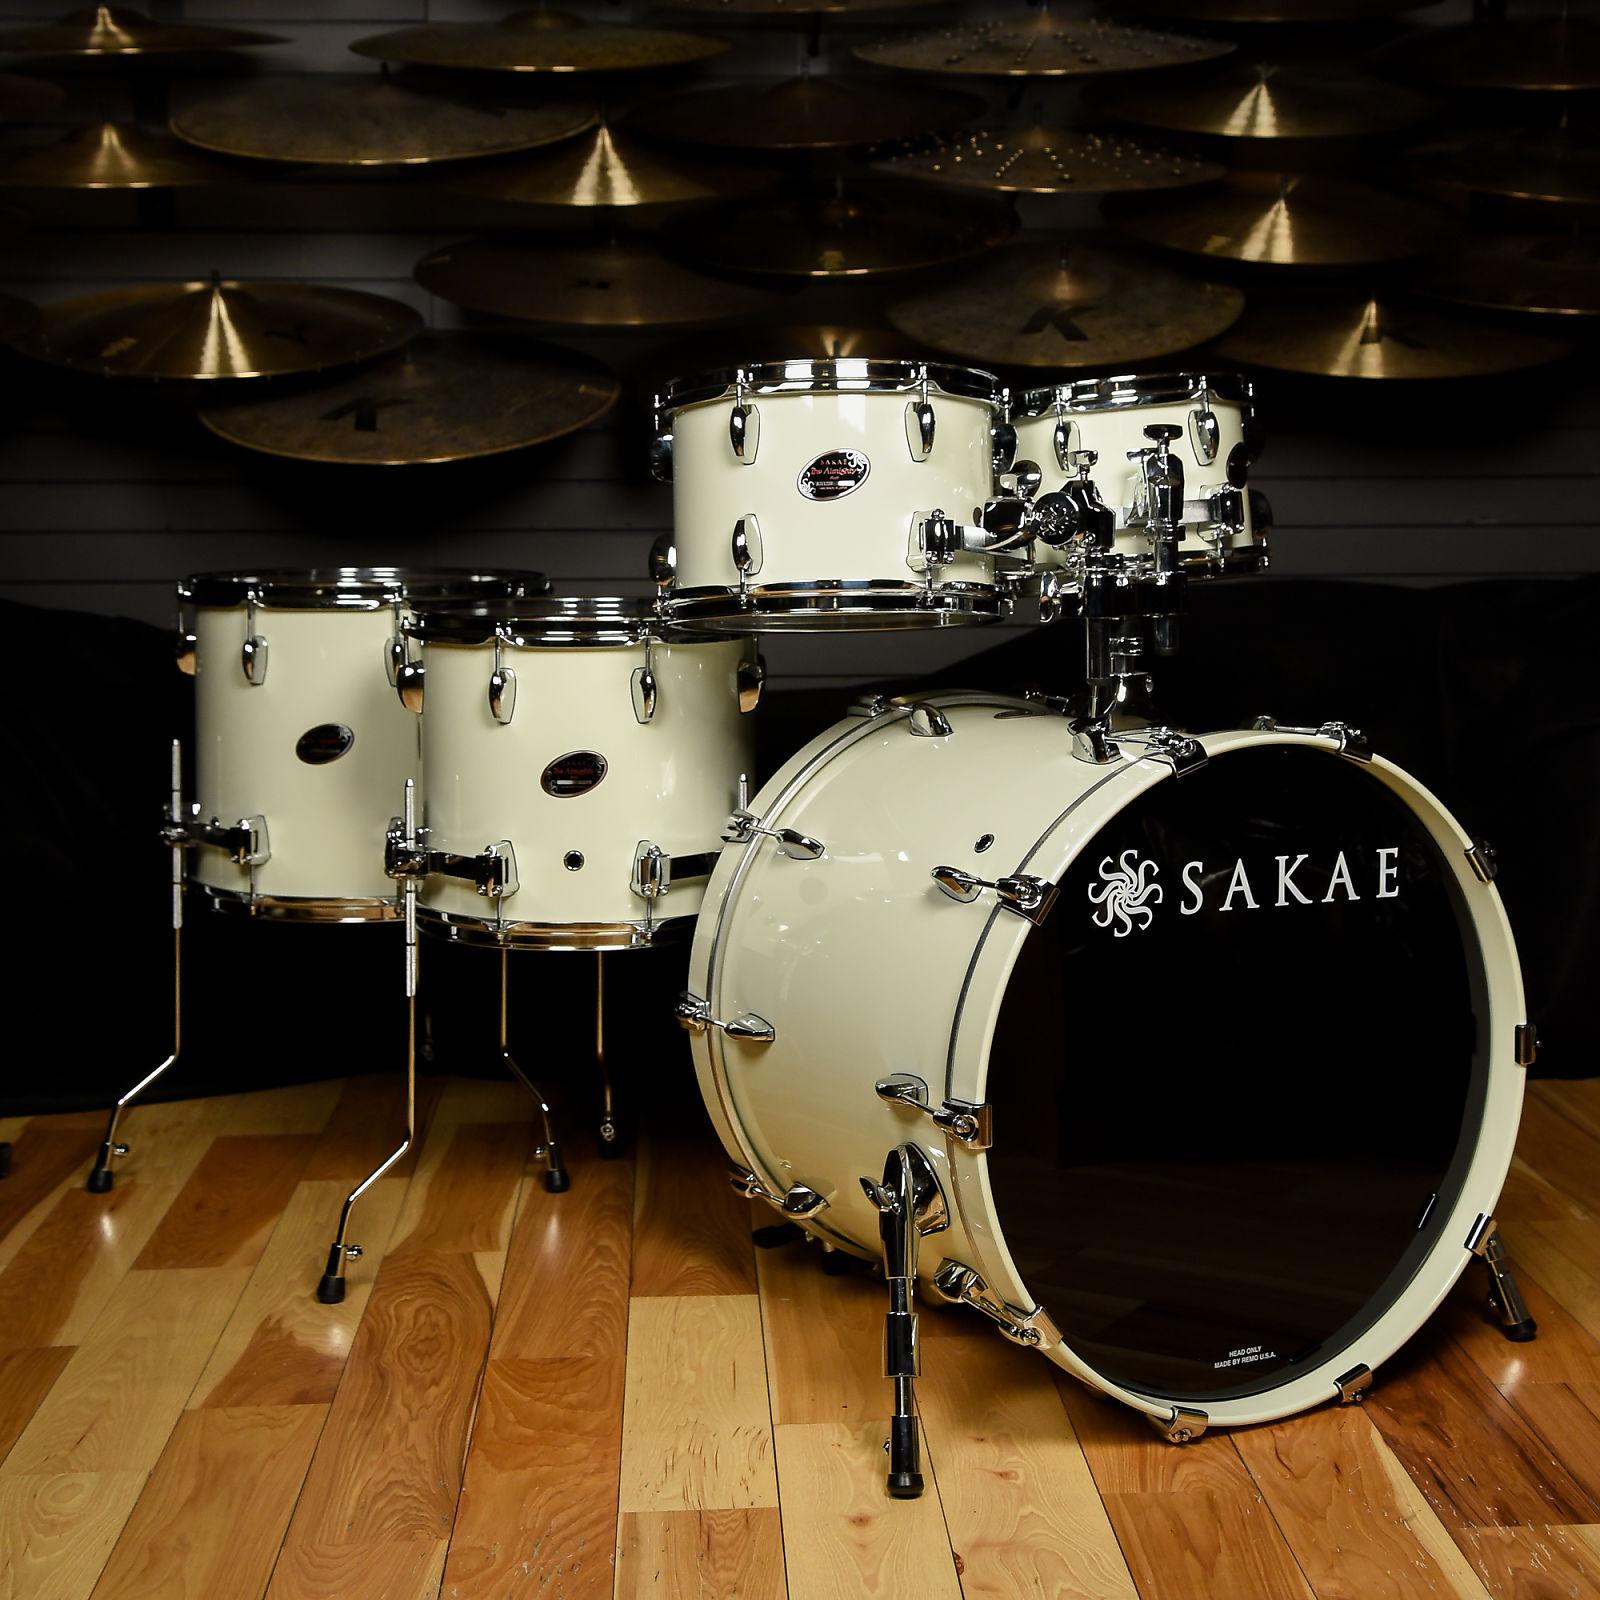 Sakae Almighty Birch 5pc Drum Kit 10 12 14 16 22 Vintage White